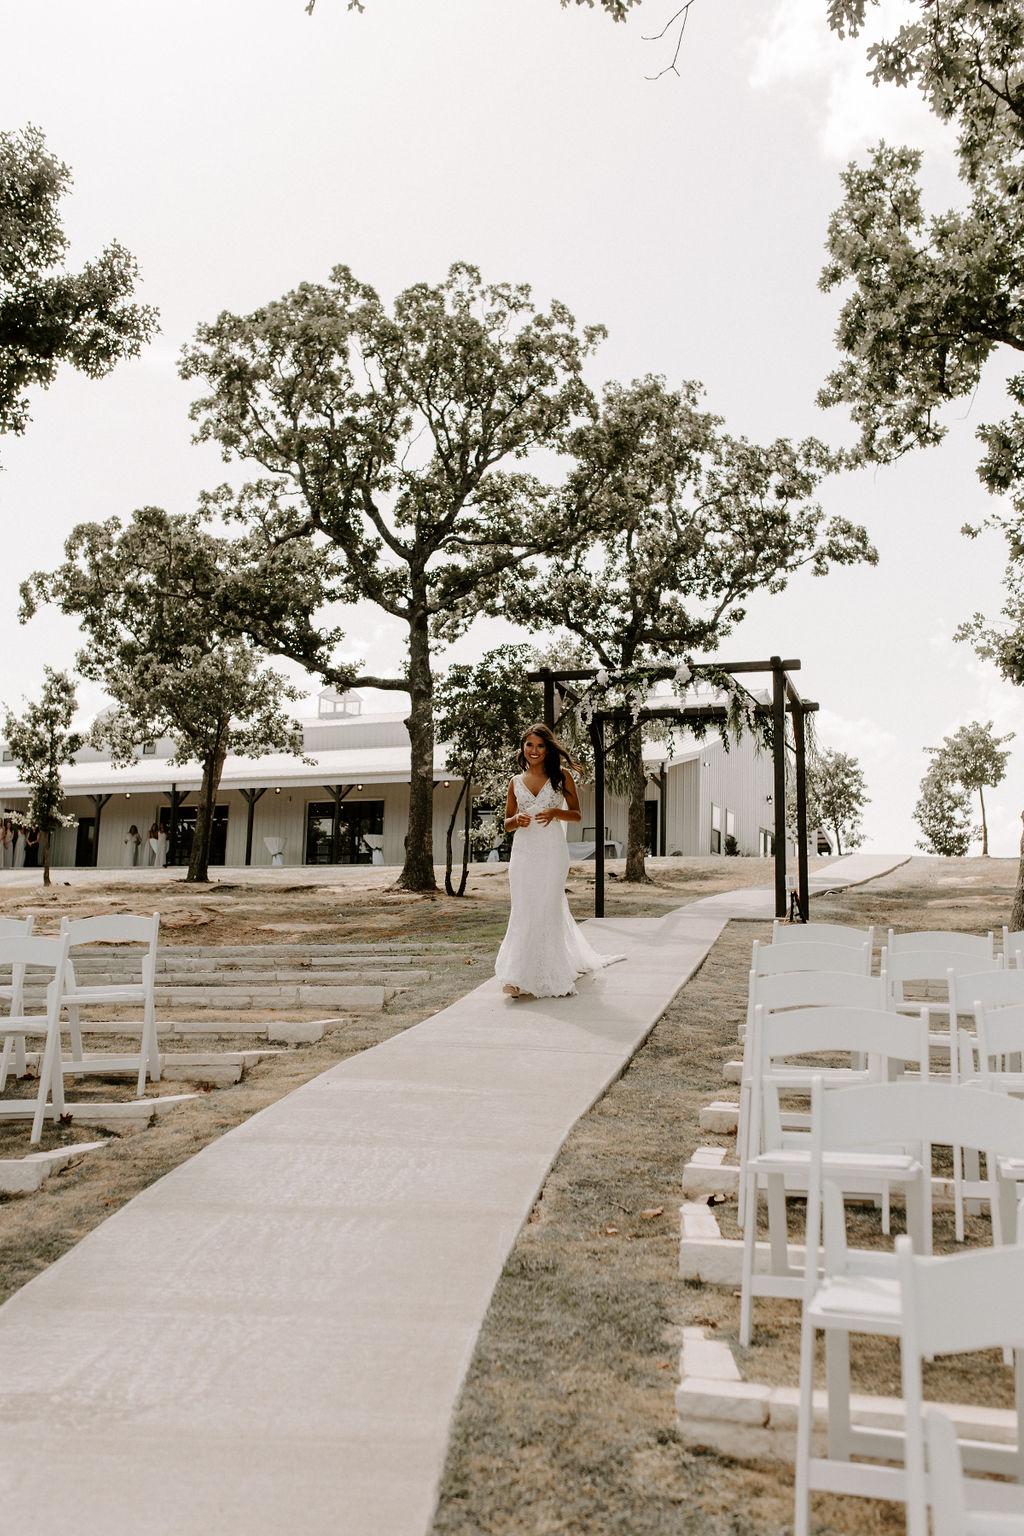 Tulsa White Barn Wedding Venue Outdoor Ceremony 37.jpg